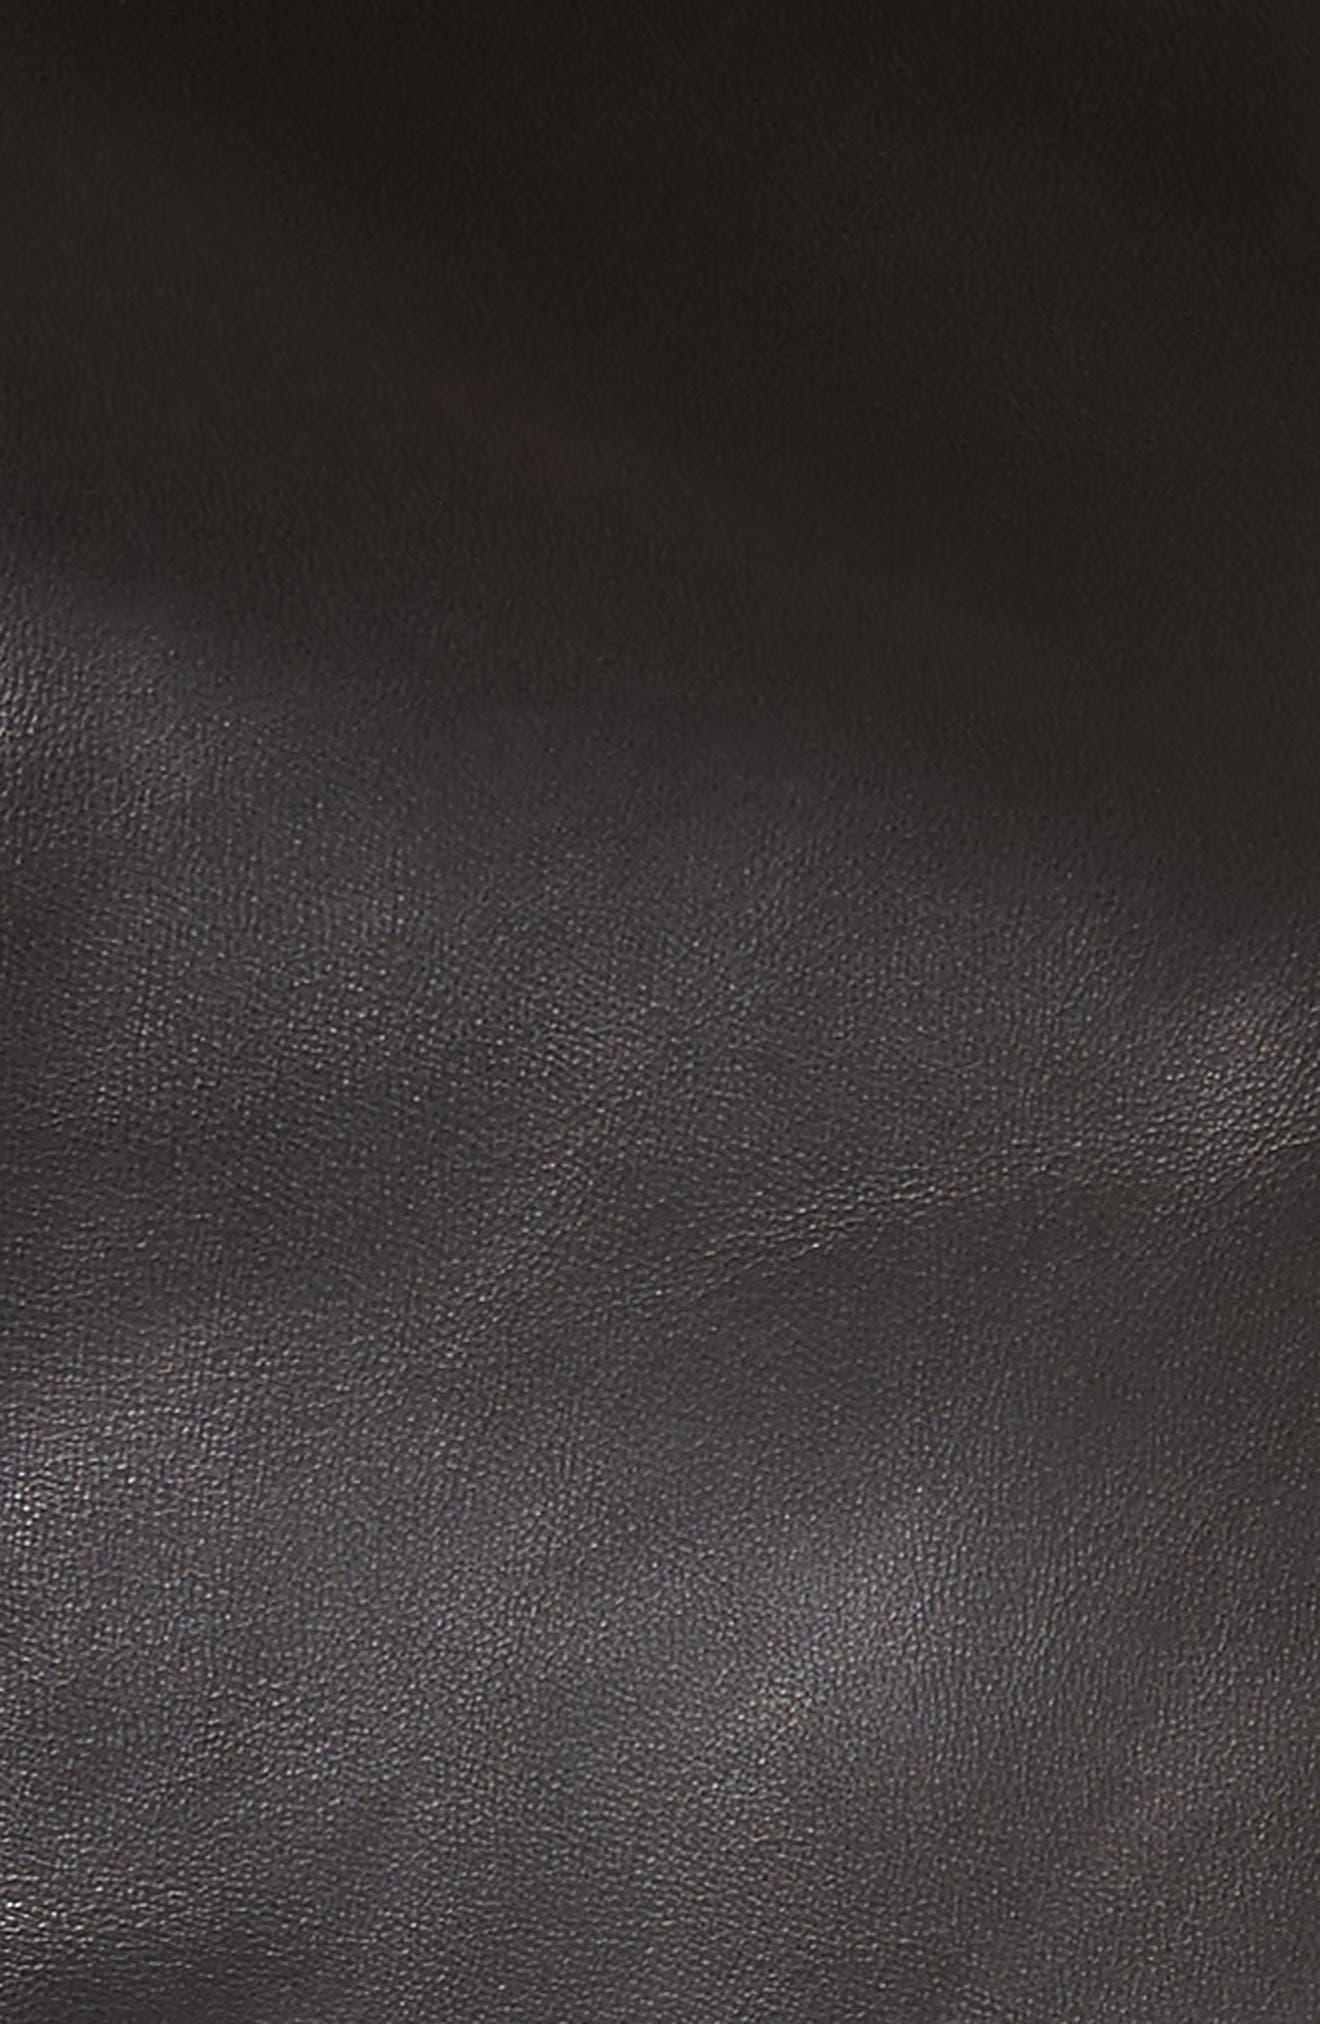 Hook Detail Lambskin Leather Jacket,                             Alternate thumbnail 5, color,                             Black